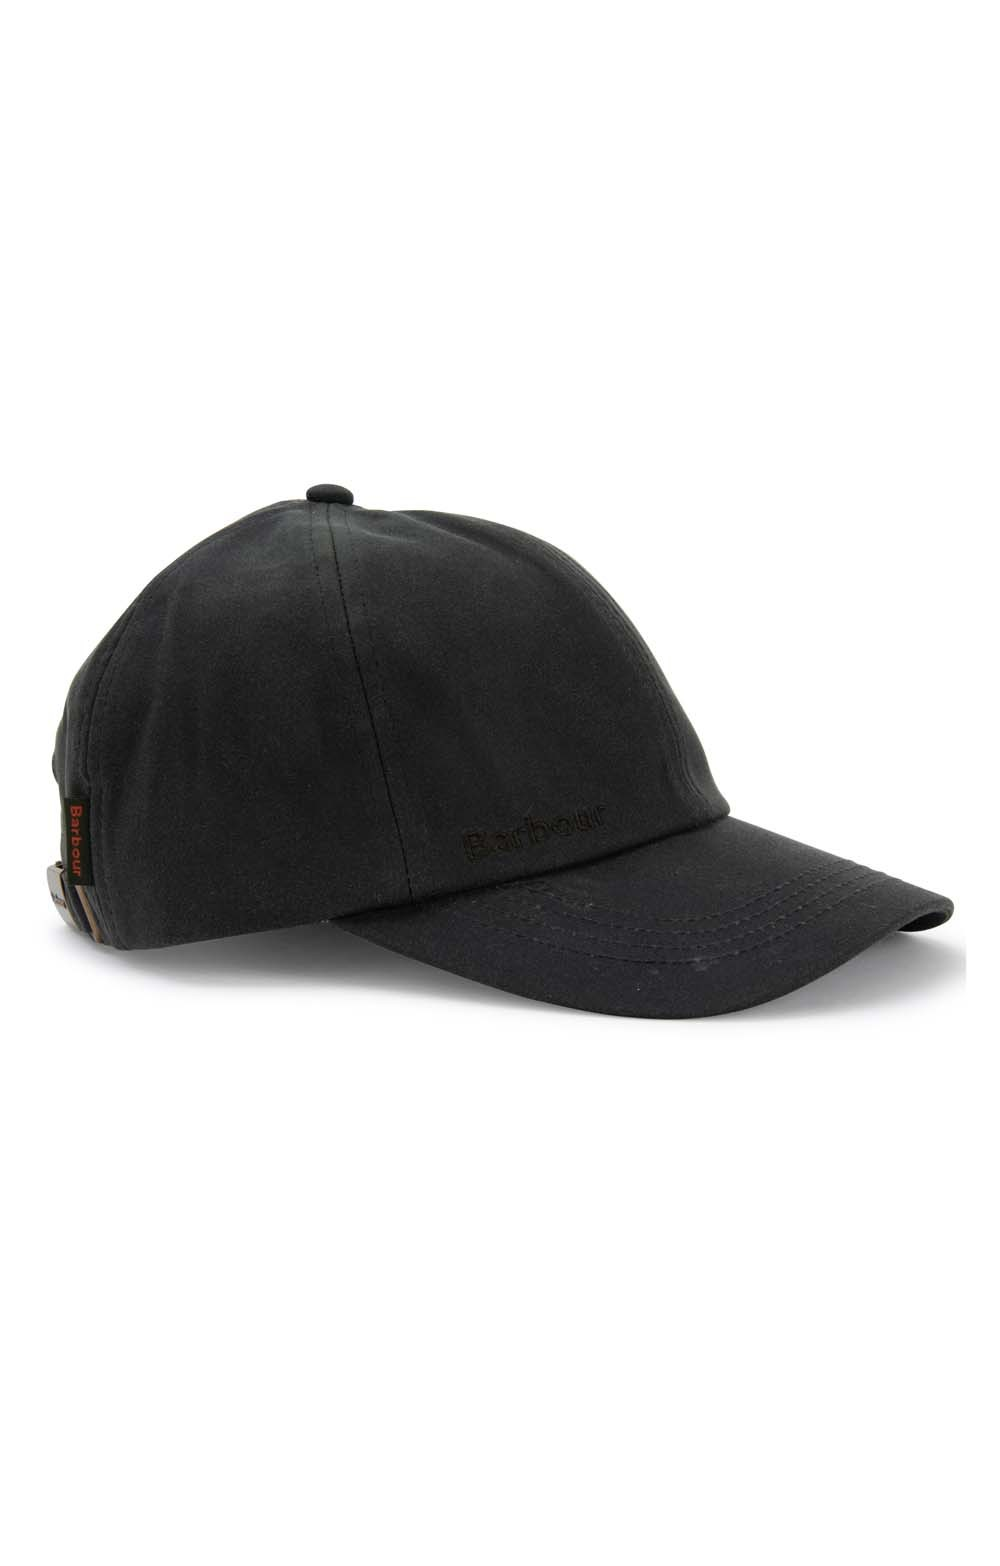 97f2d4a280271 Barbour Wax Sports Cap